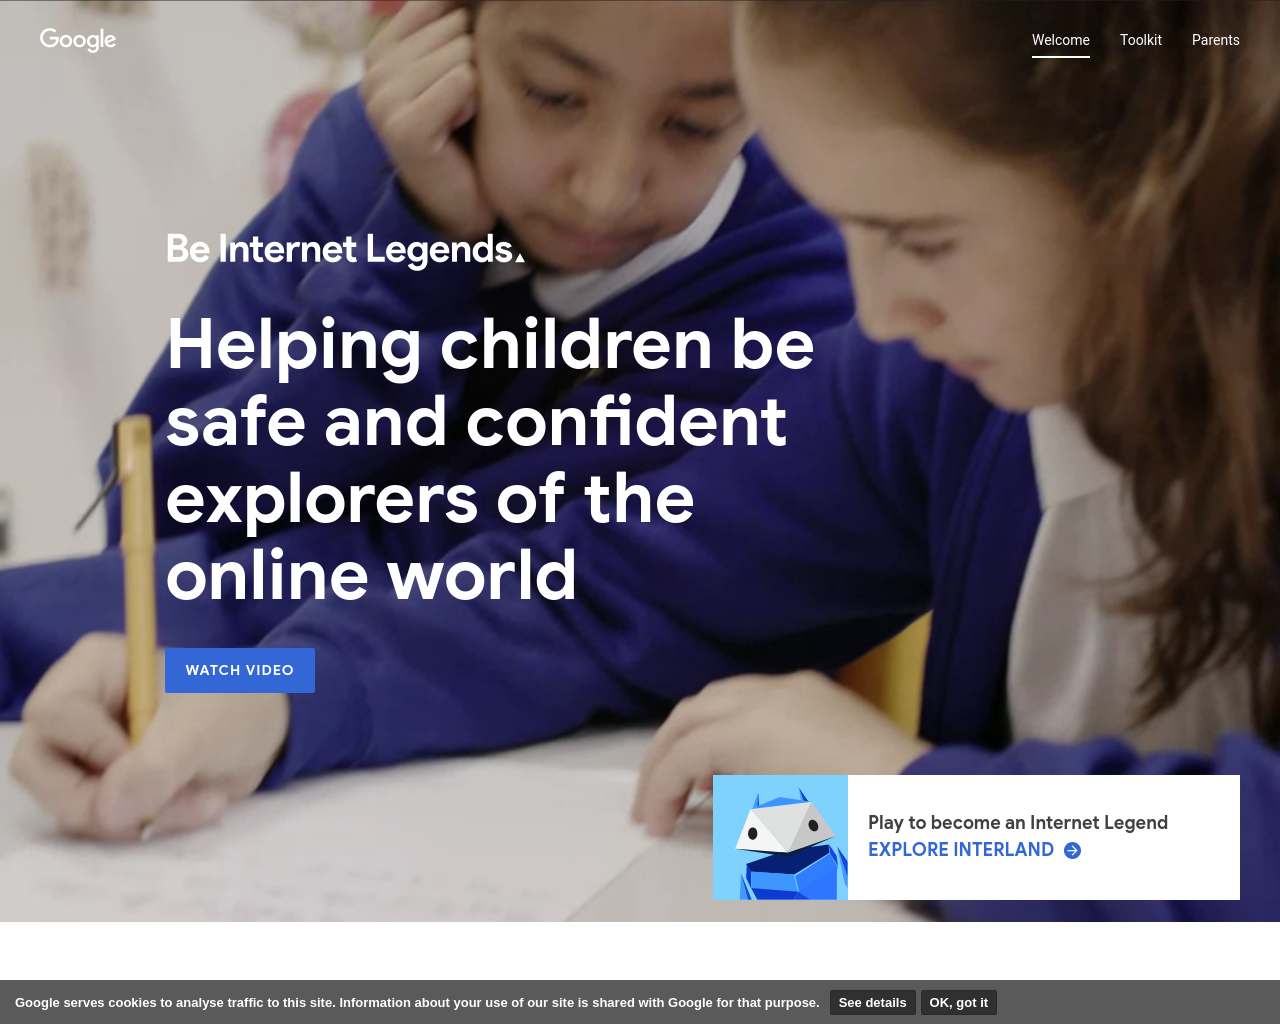 Be Internet Legends